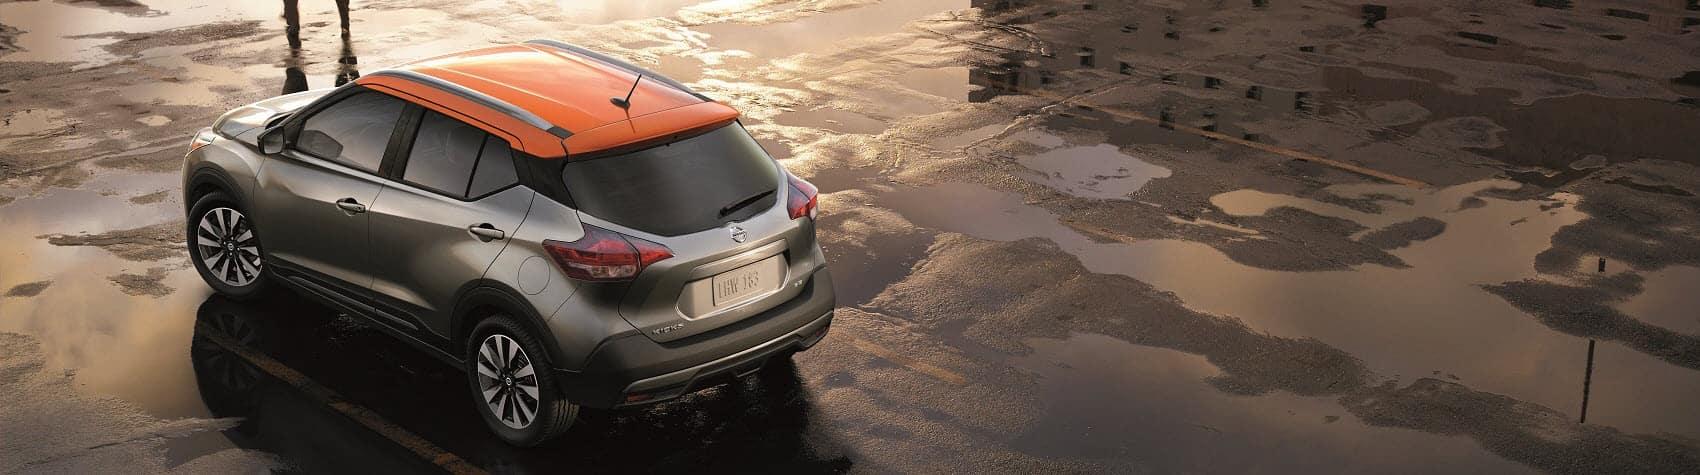 Nissan Kicks Orange